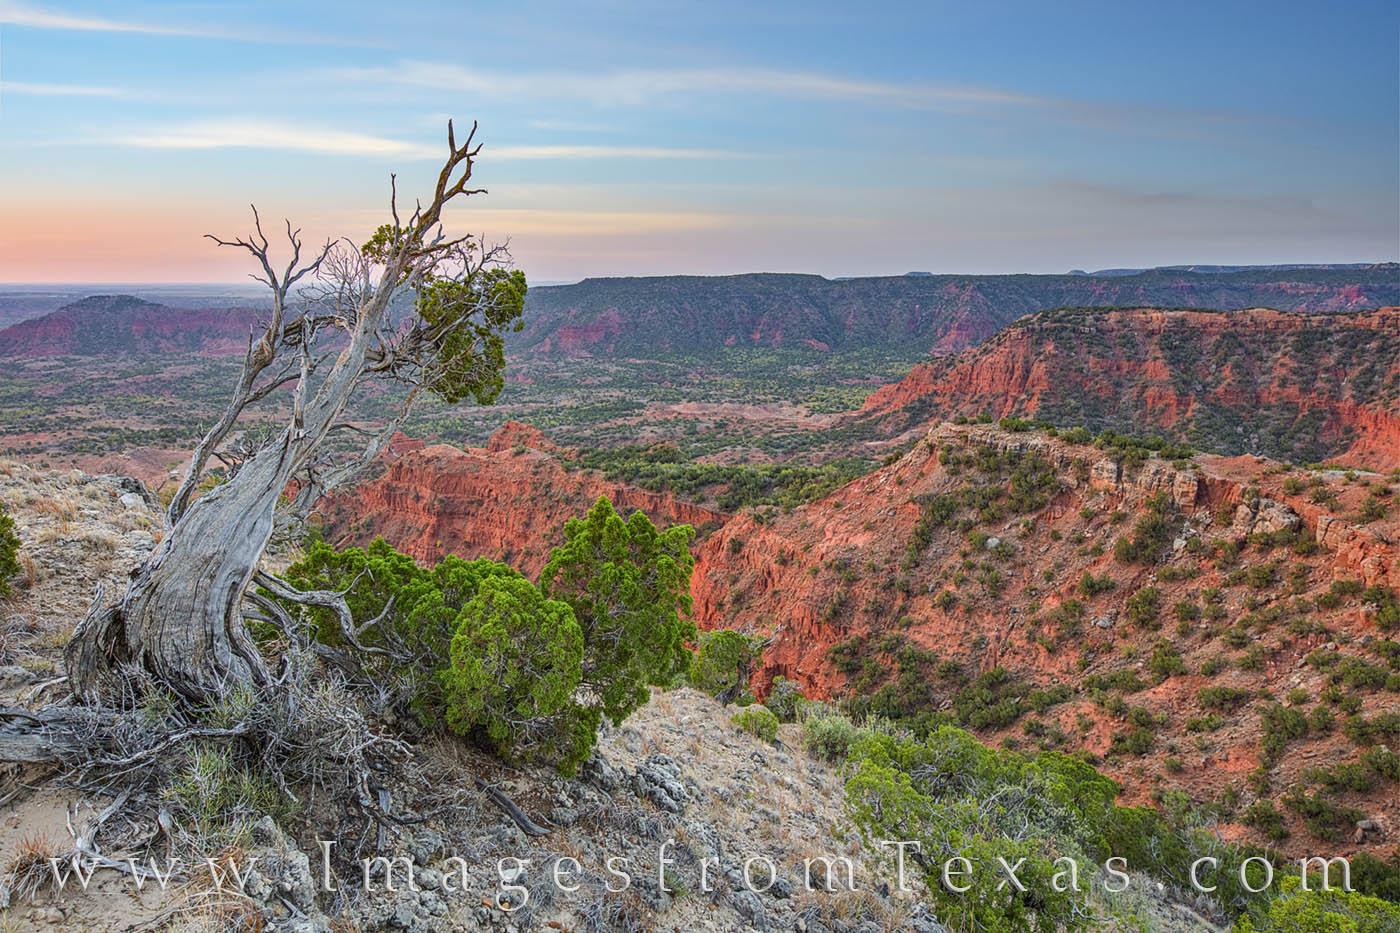 caprock canyons state park, caprock canyons, haynes ridge overlook, haynes ridge trail, west texas, texas prints, caprick prints, photo